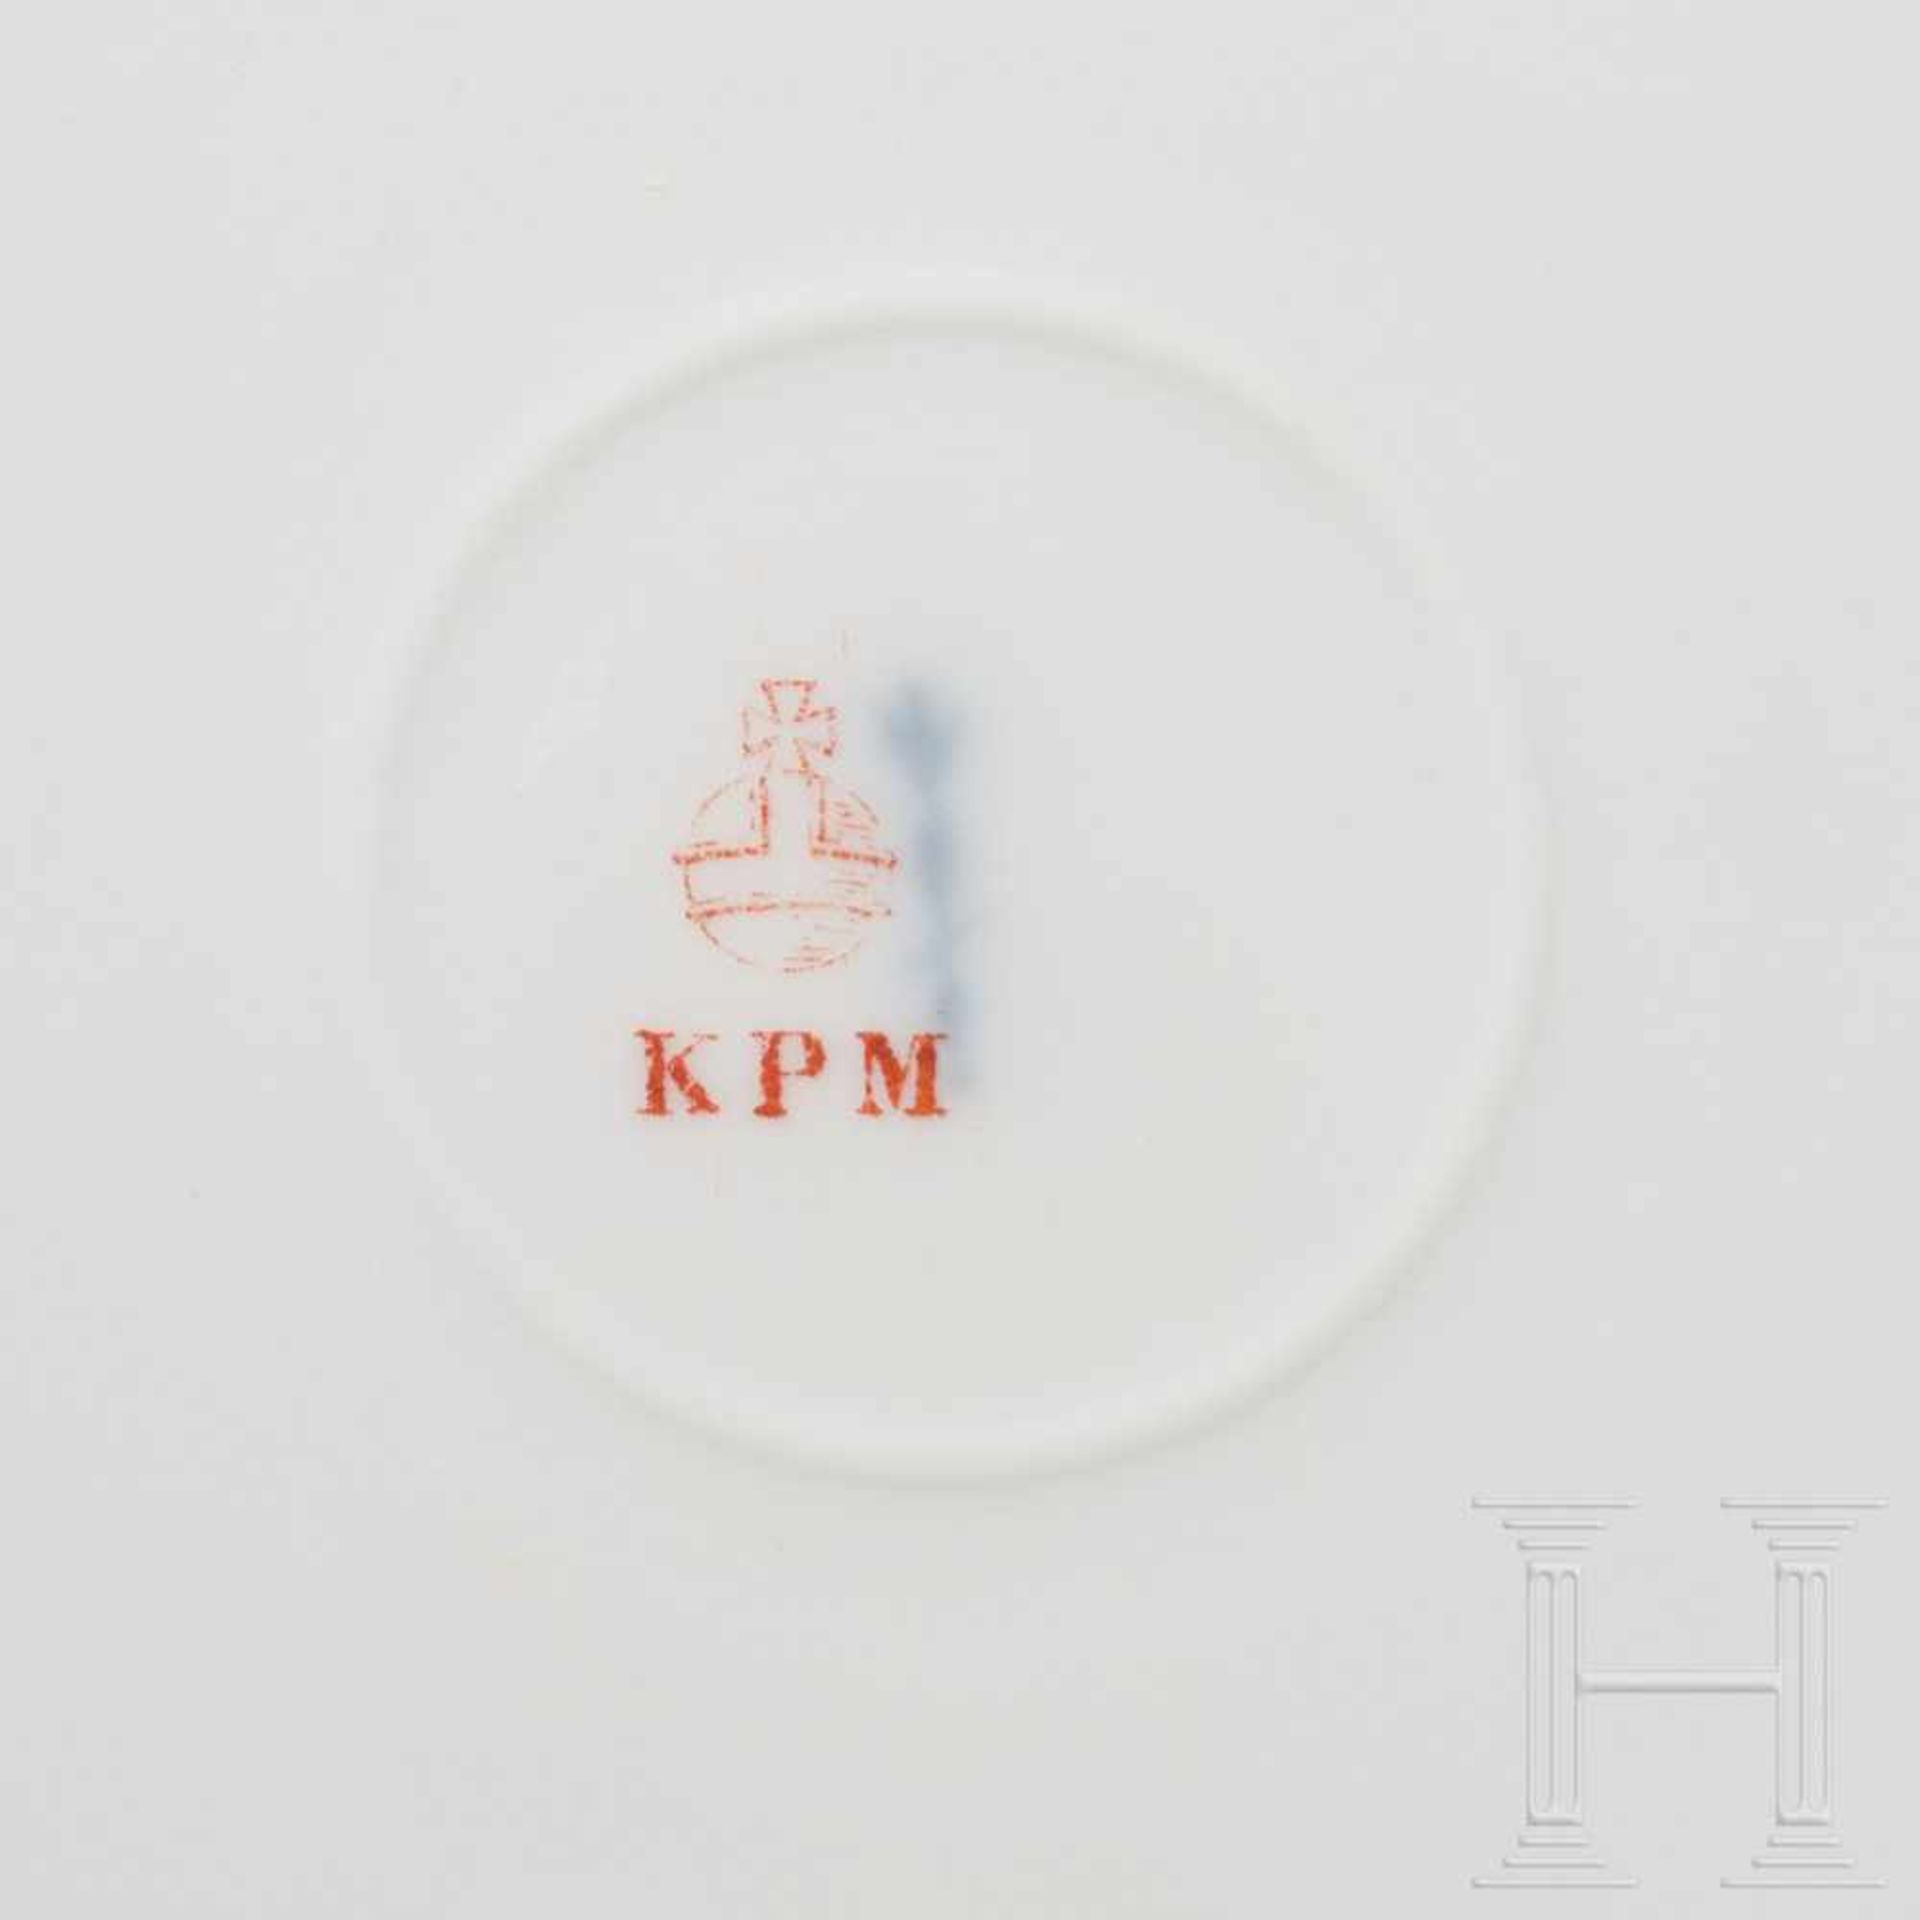 Los 6038 - Hermann Göring - two dinner plates from his KPM dining serviceWeißes, glasiertes Porzellan mit